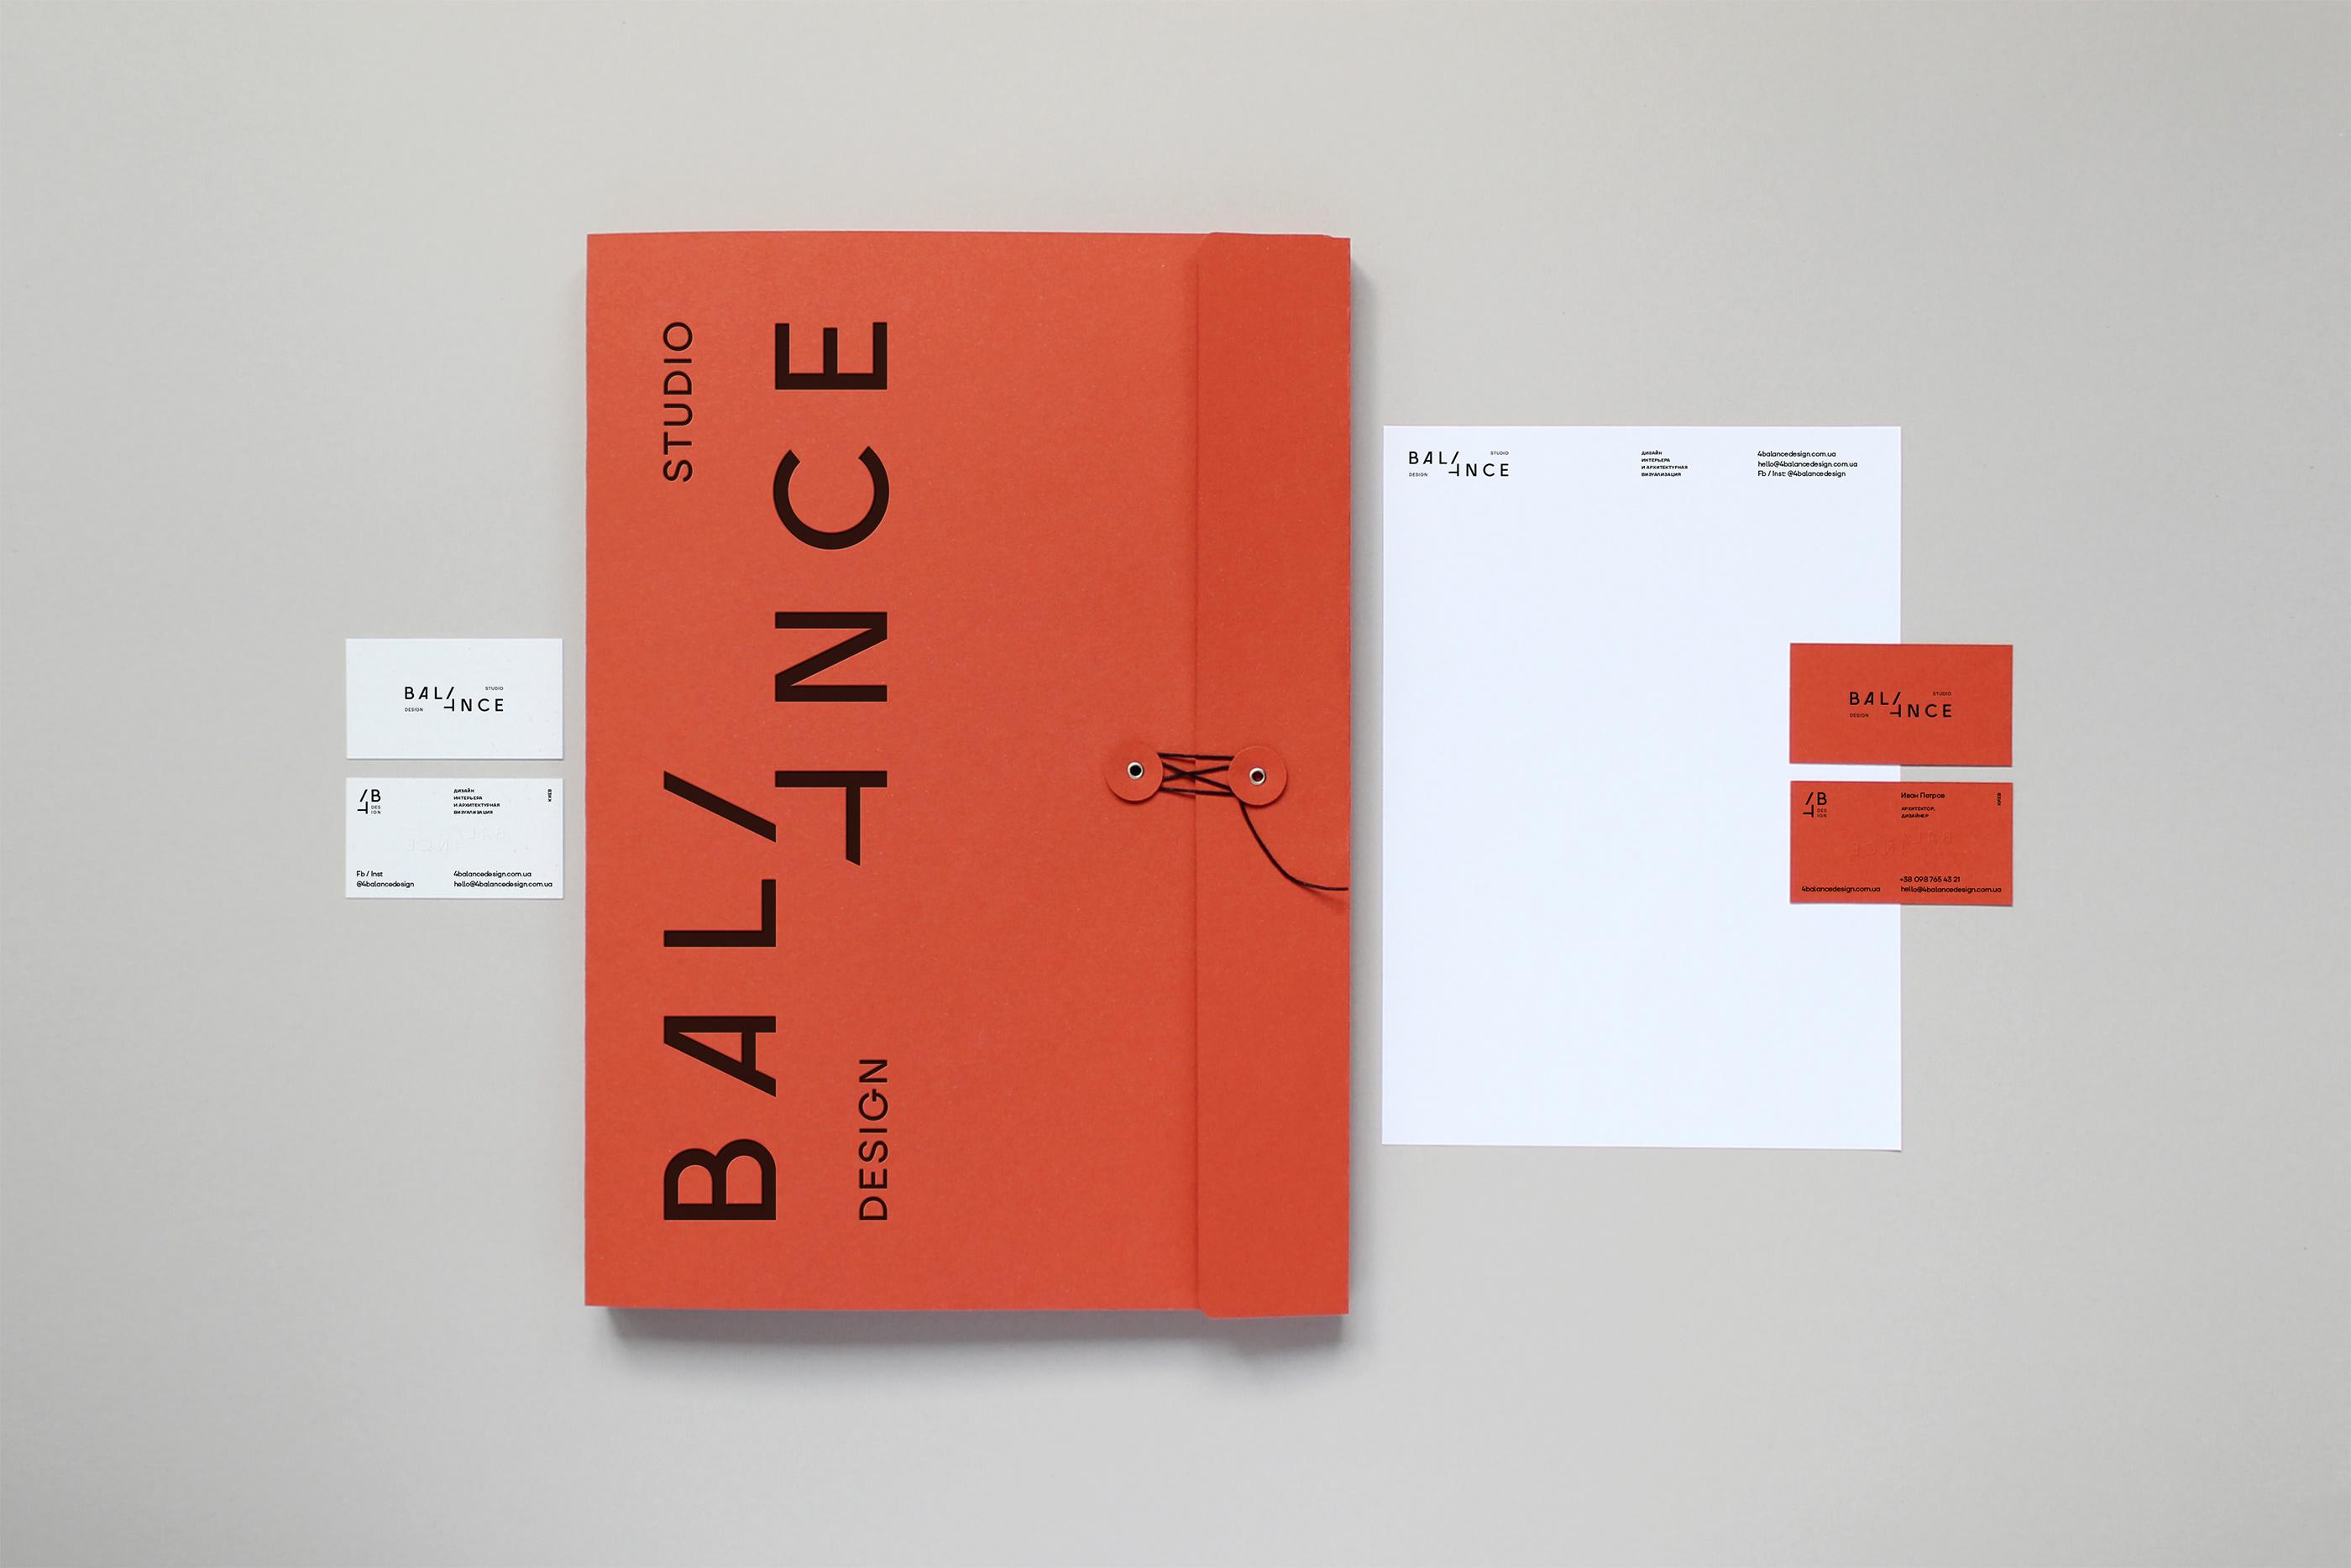 4balance Design Studio Identity by Daria Stetsenko